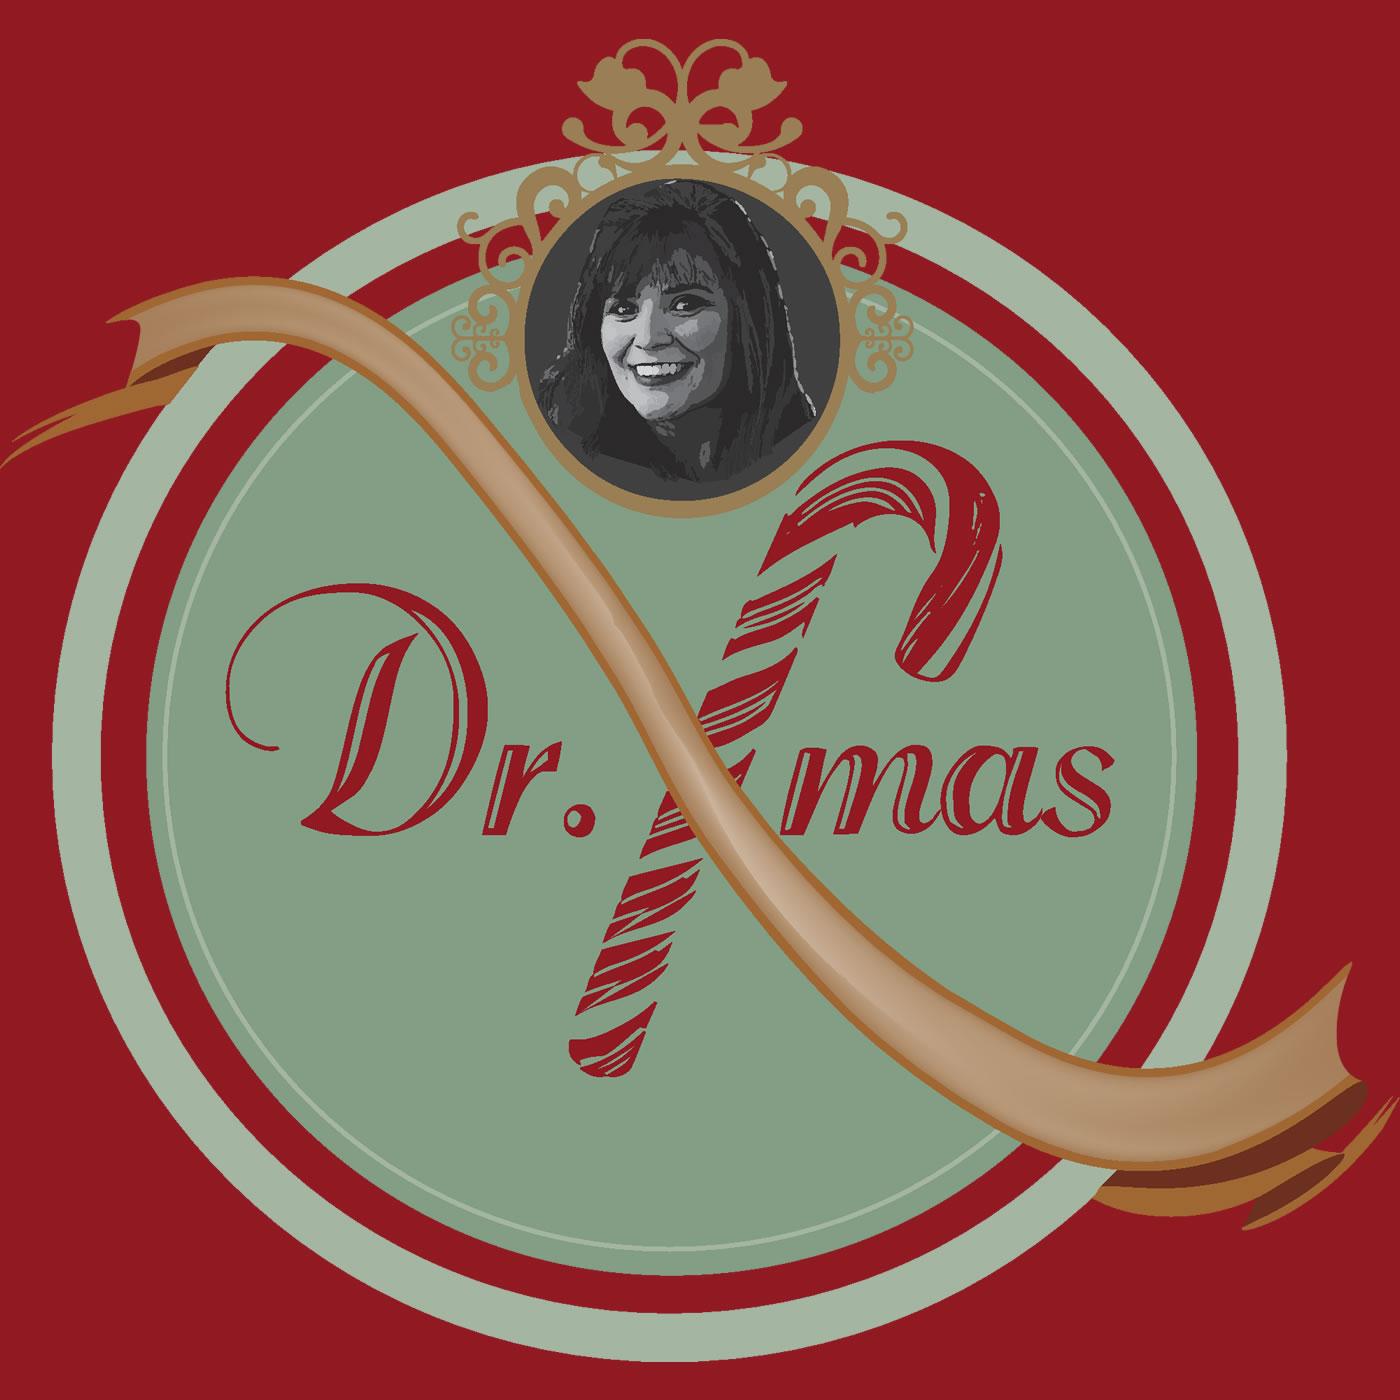 Dr. Xmas